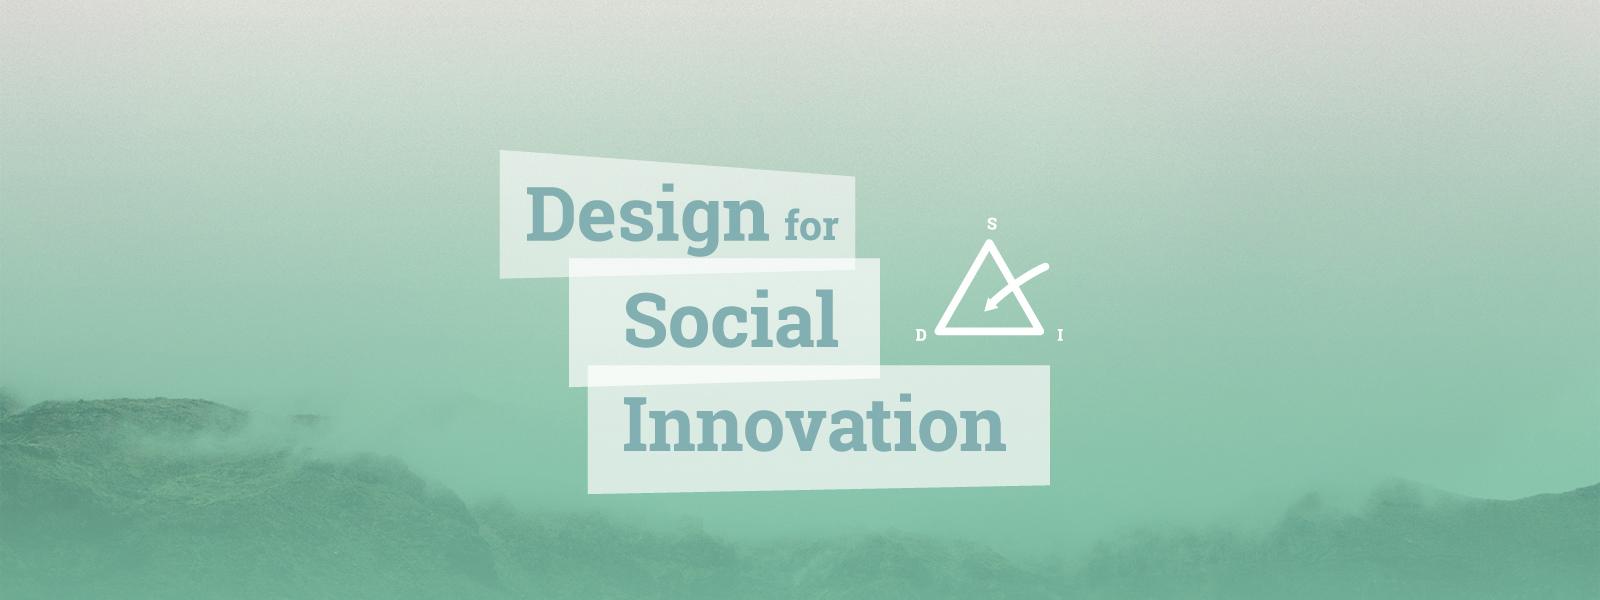 DSI Symposium 2018 logo